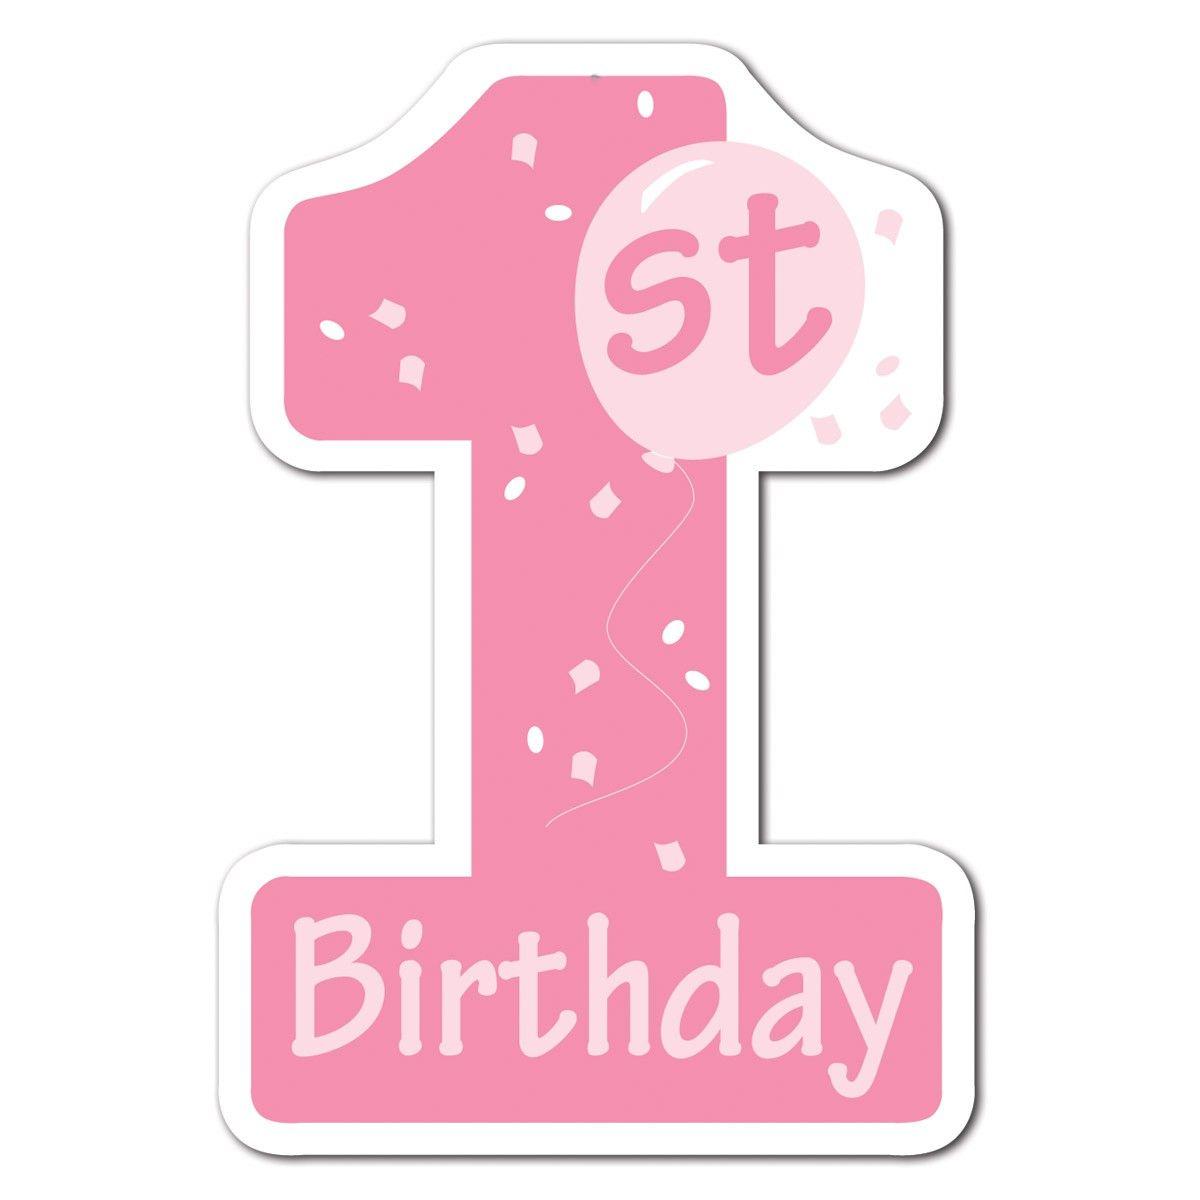 1st birthday clipart clipartfest 1st birthday minnie mouse rh pinterest com baby's 1st birthday clipart baby's 1st birthday clipart